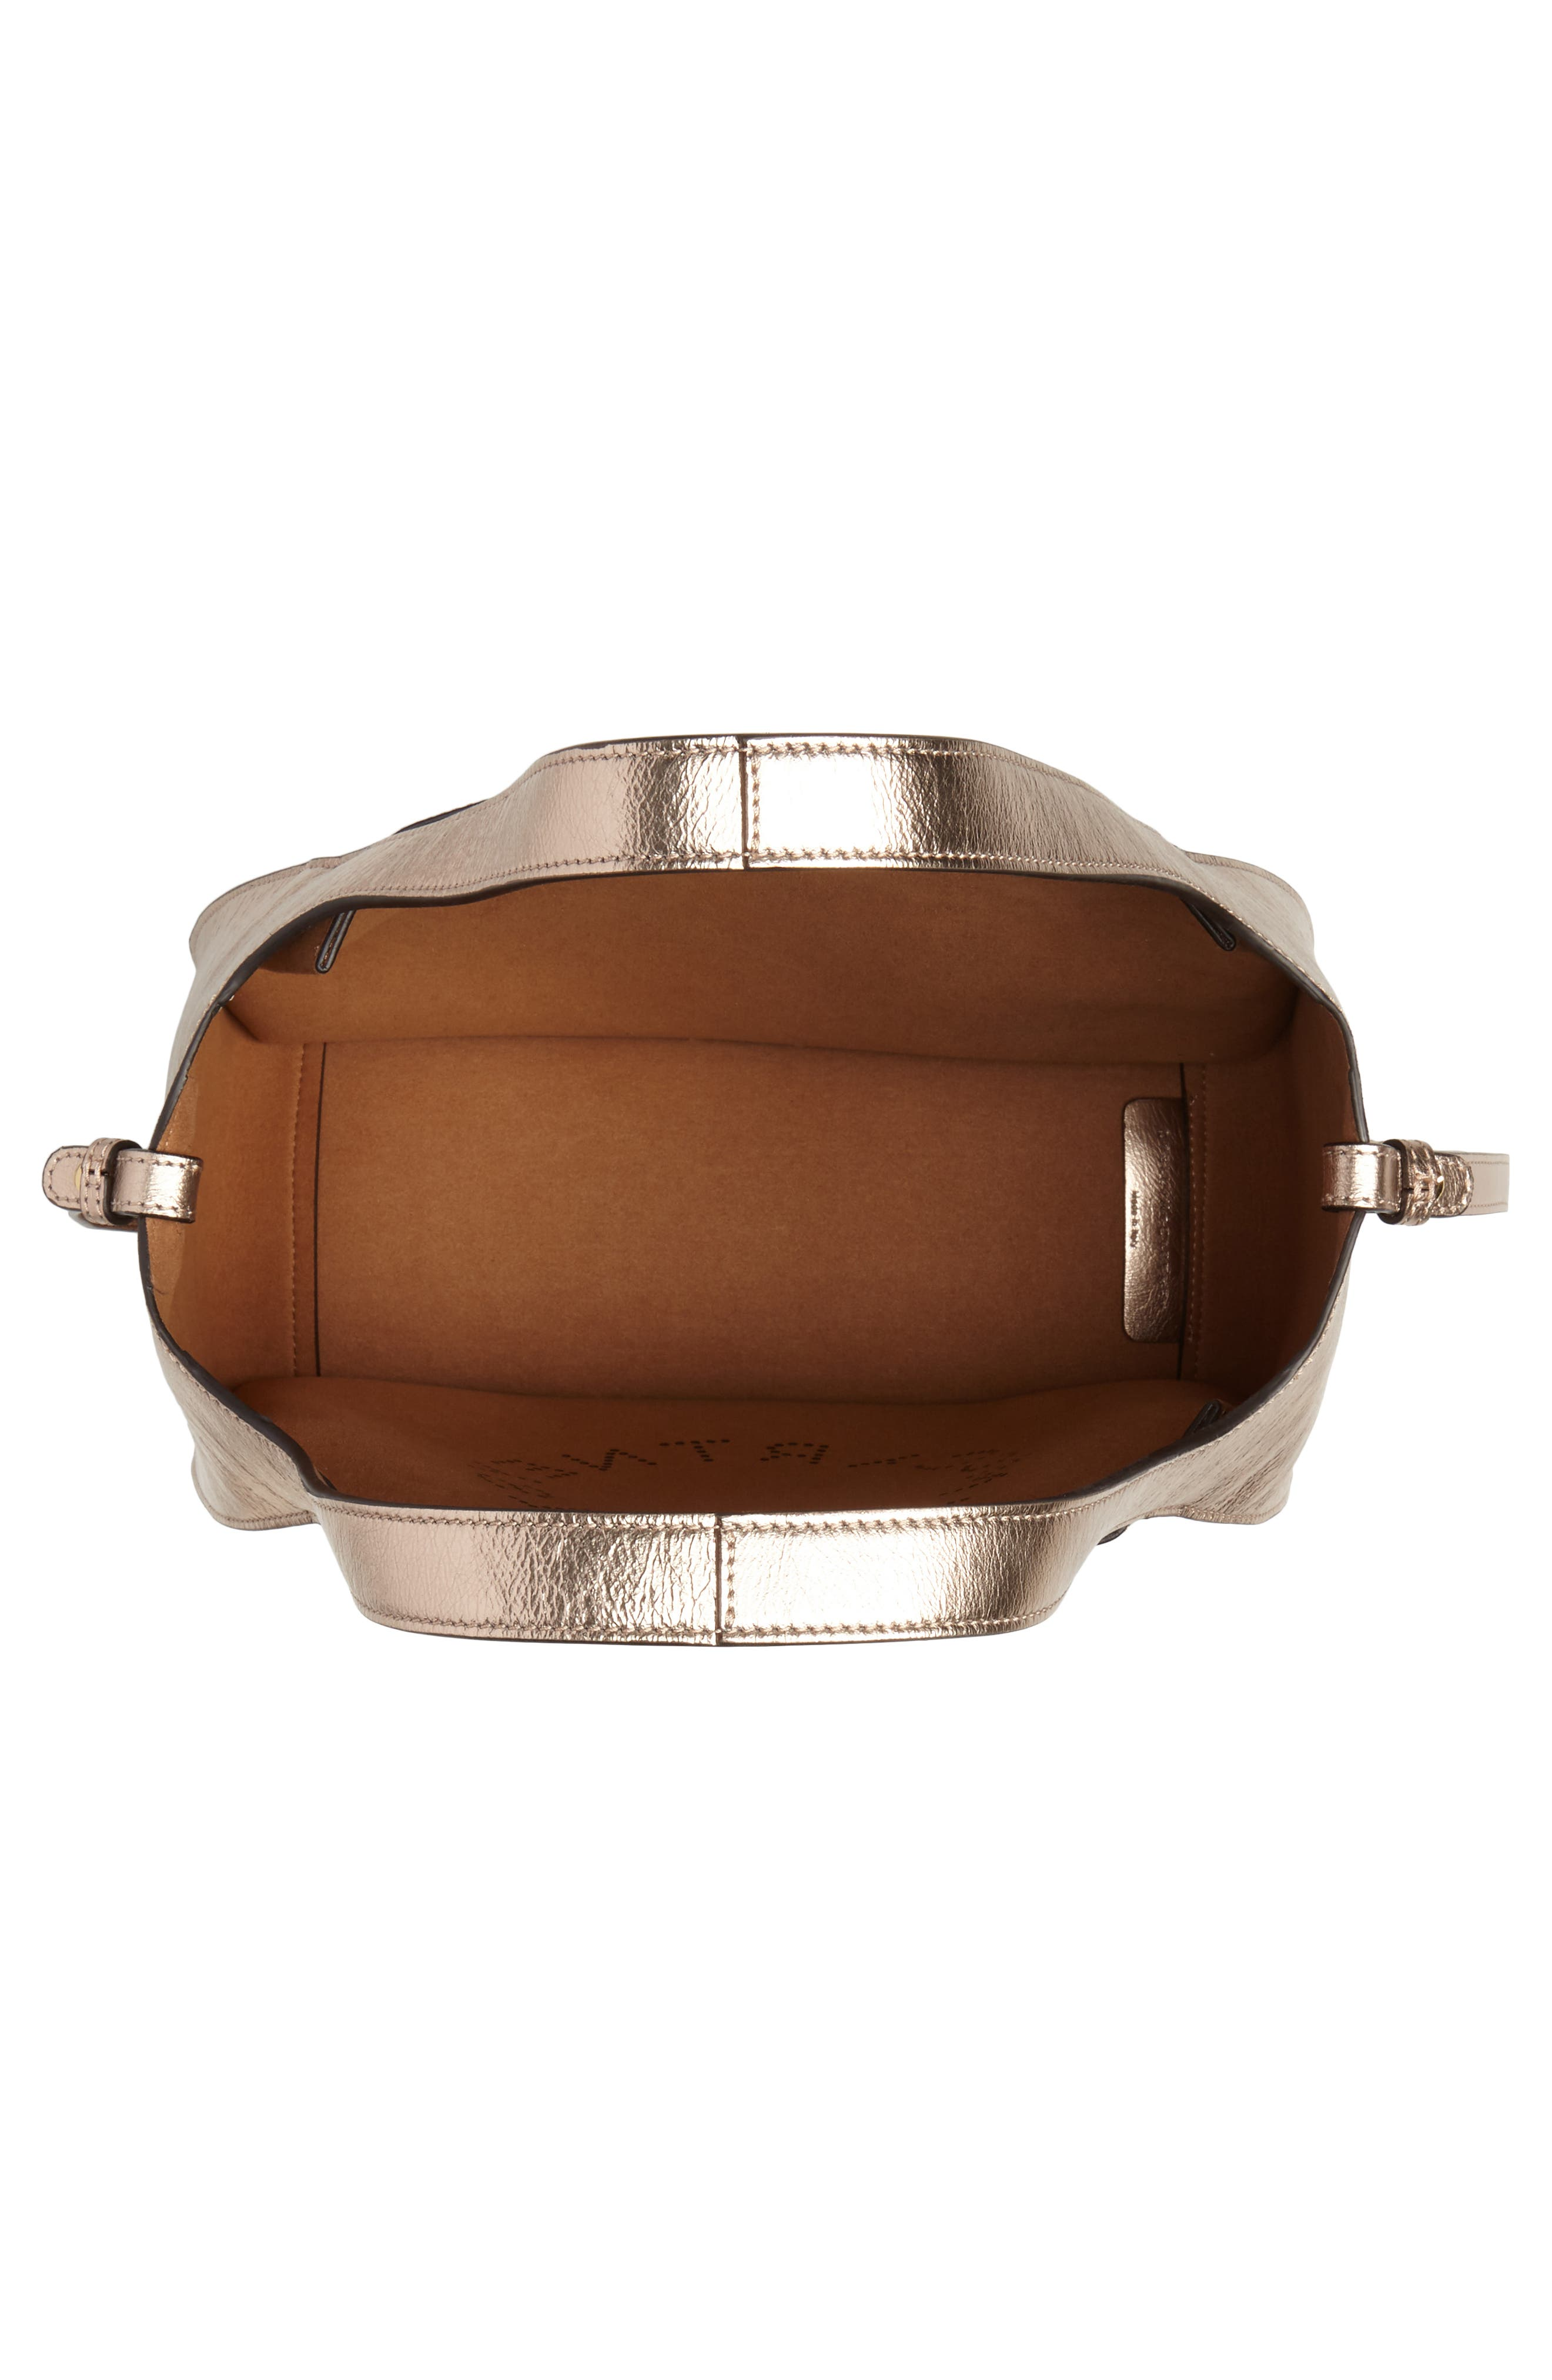 STELLA MCCARTNEY, Perforated Logo Metallic Faux Leather Satchel, Alternate thumbnail 4, color, ROSE GOLD